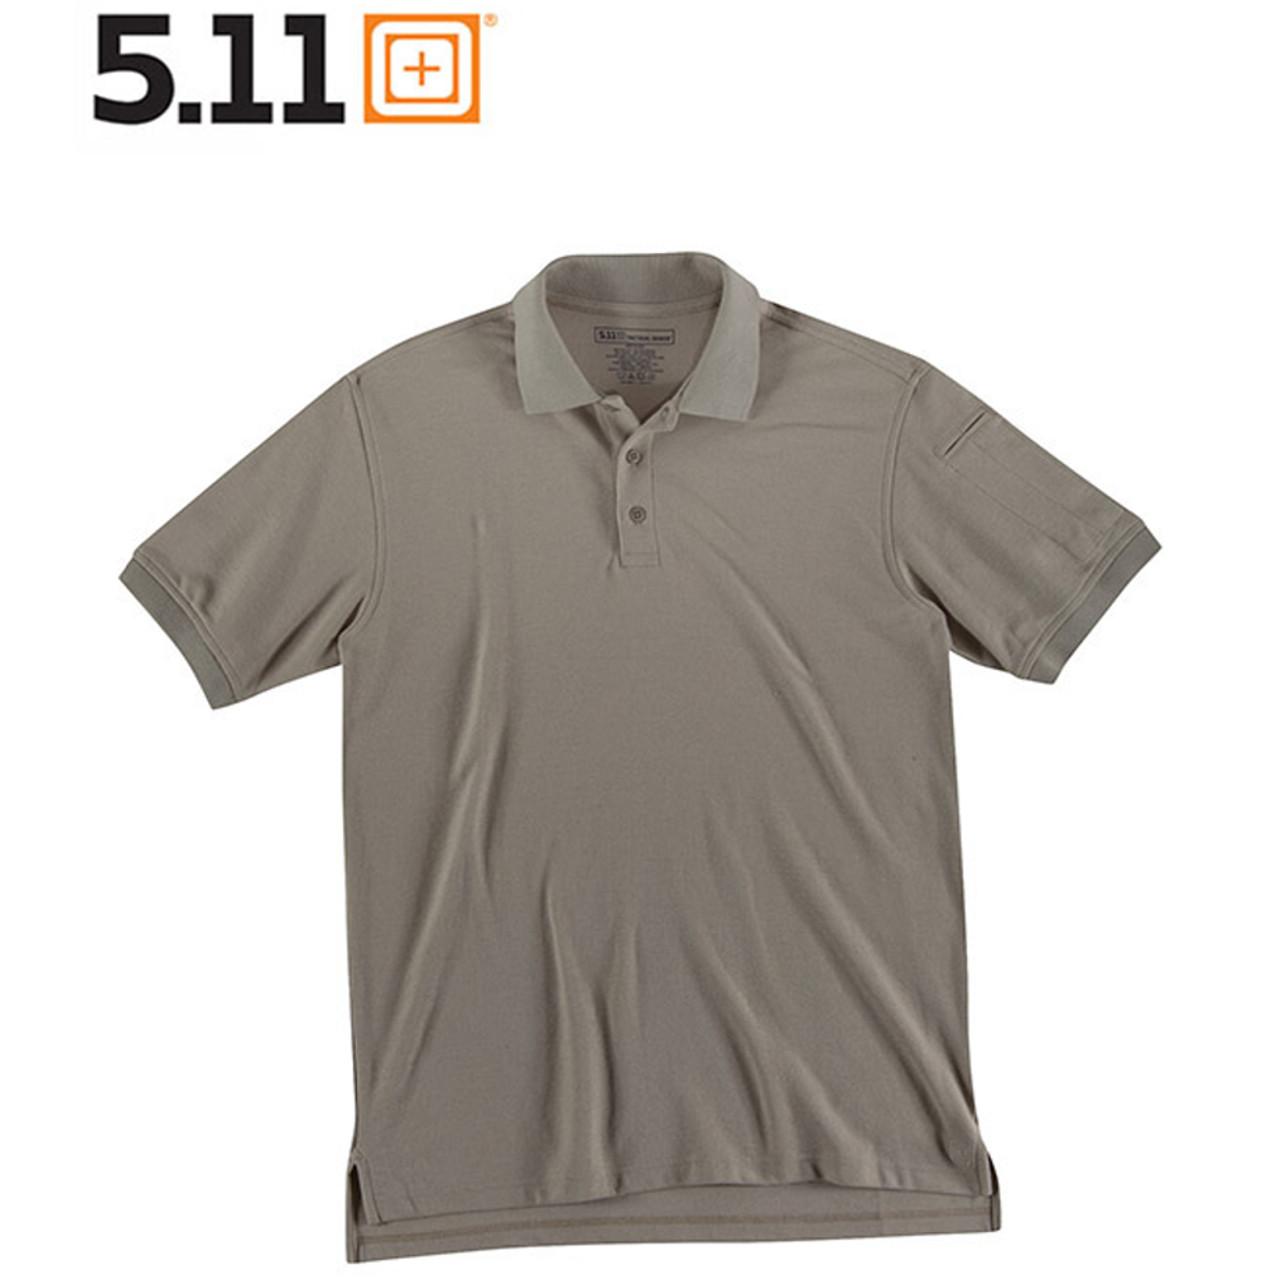 5.11 UTILITY POLO Kurzarm-Shirt silver tan